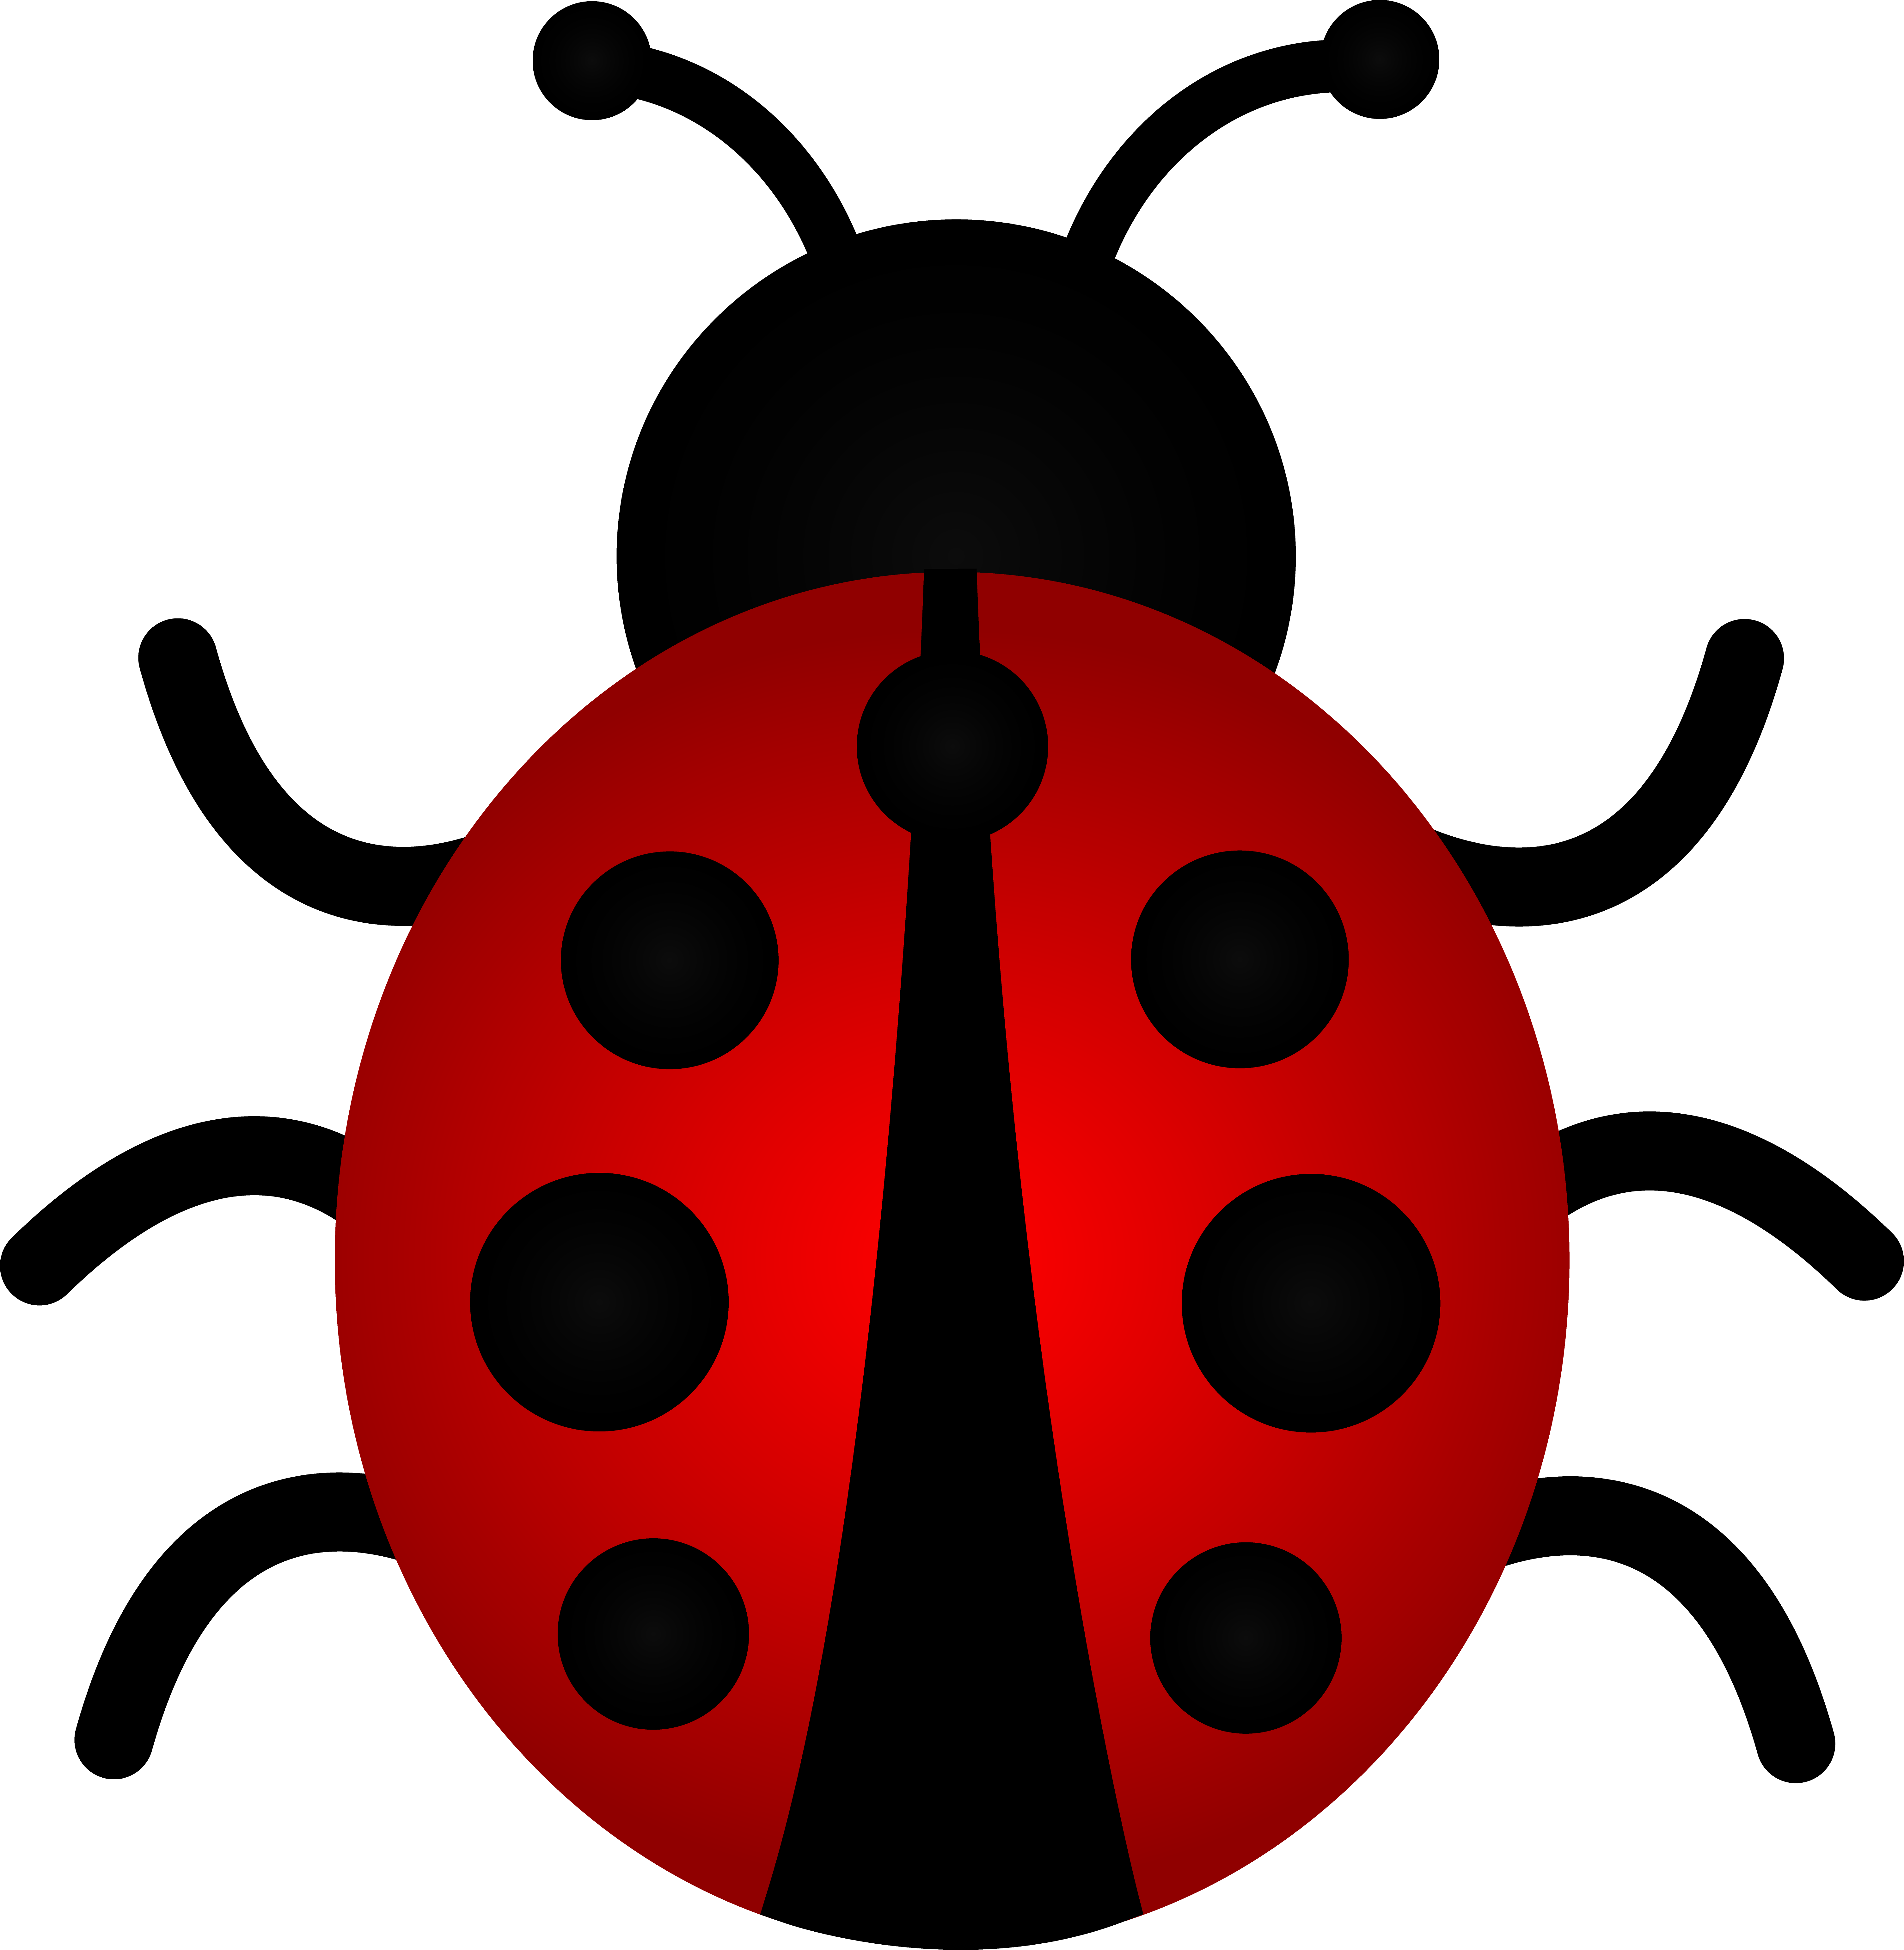 Ladybug Clip Art Border.